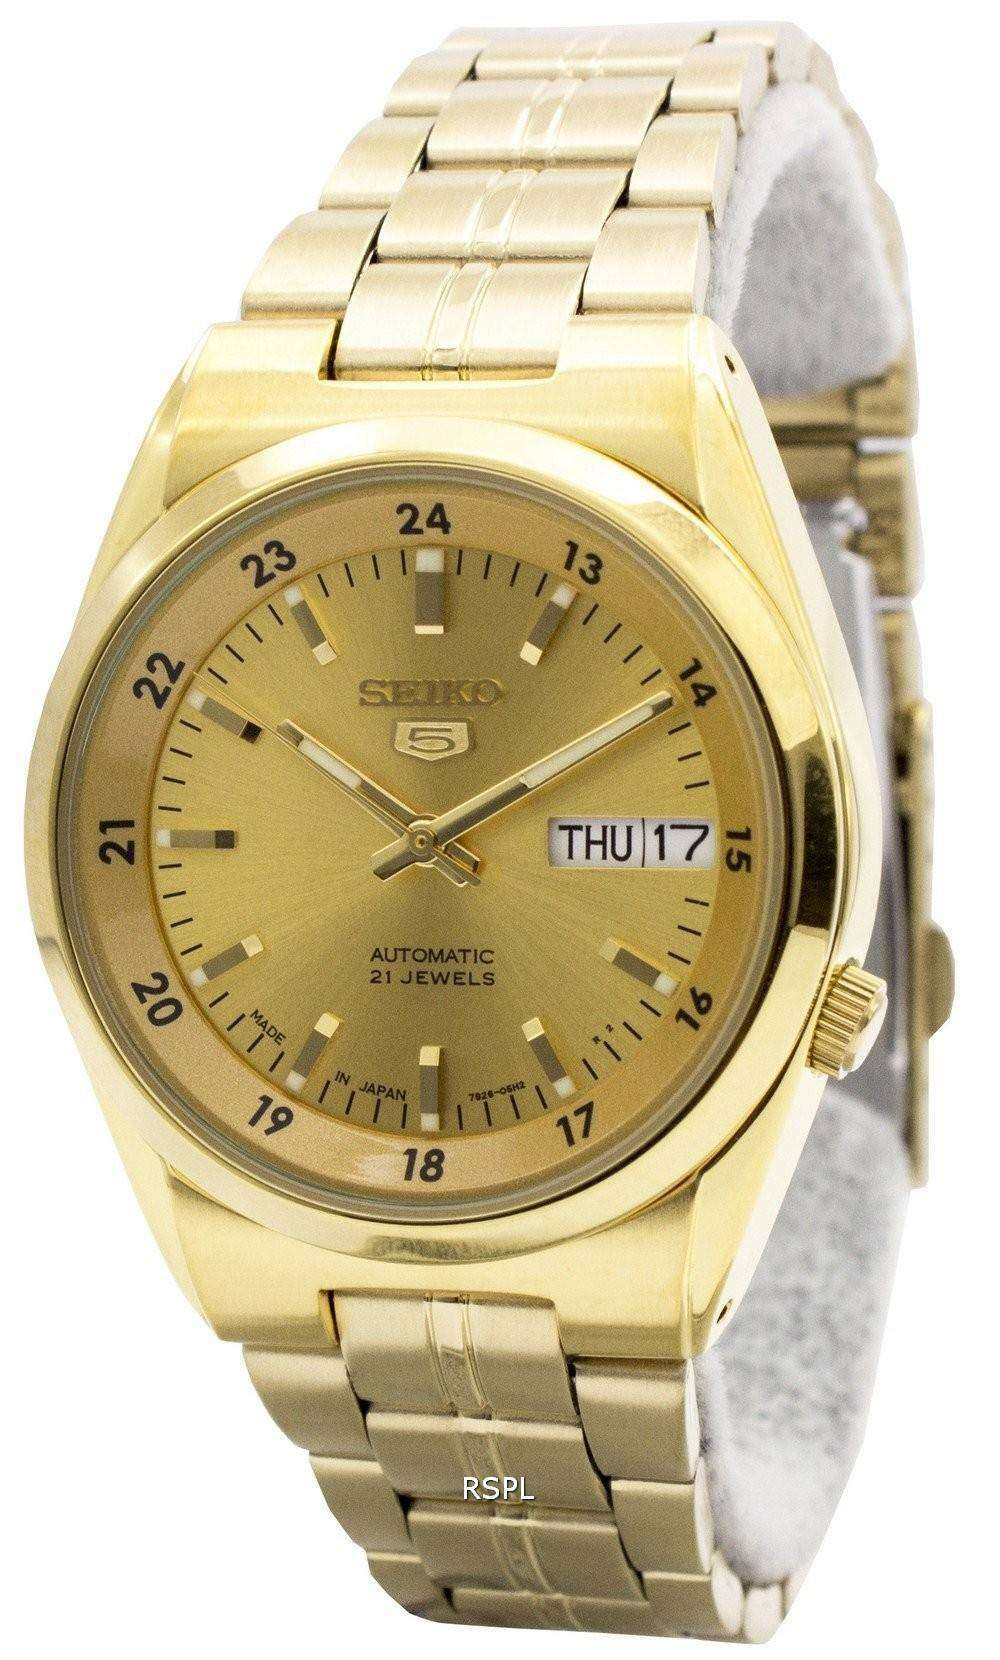 Seiko 5 automatic 21 jewels watch price - fashion